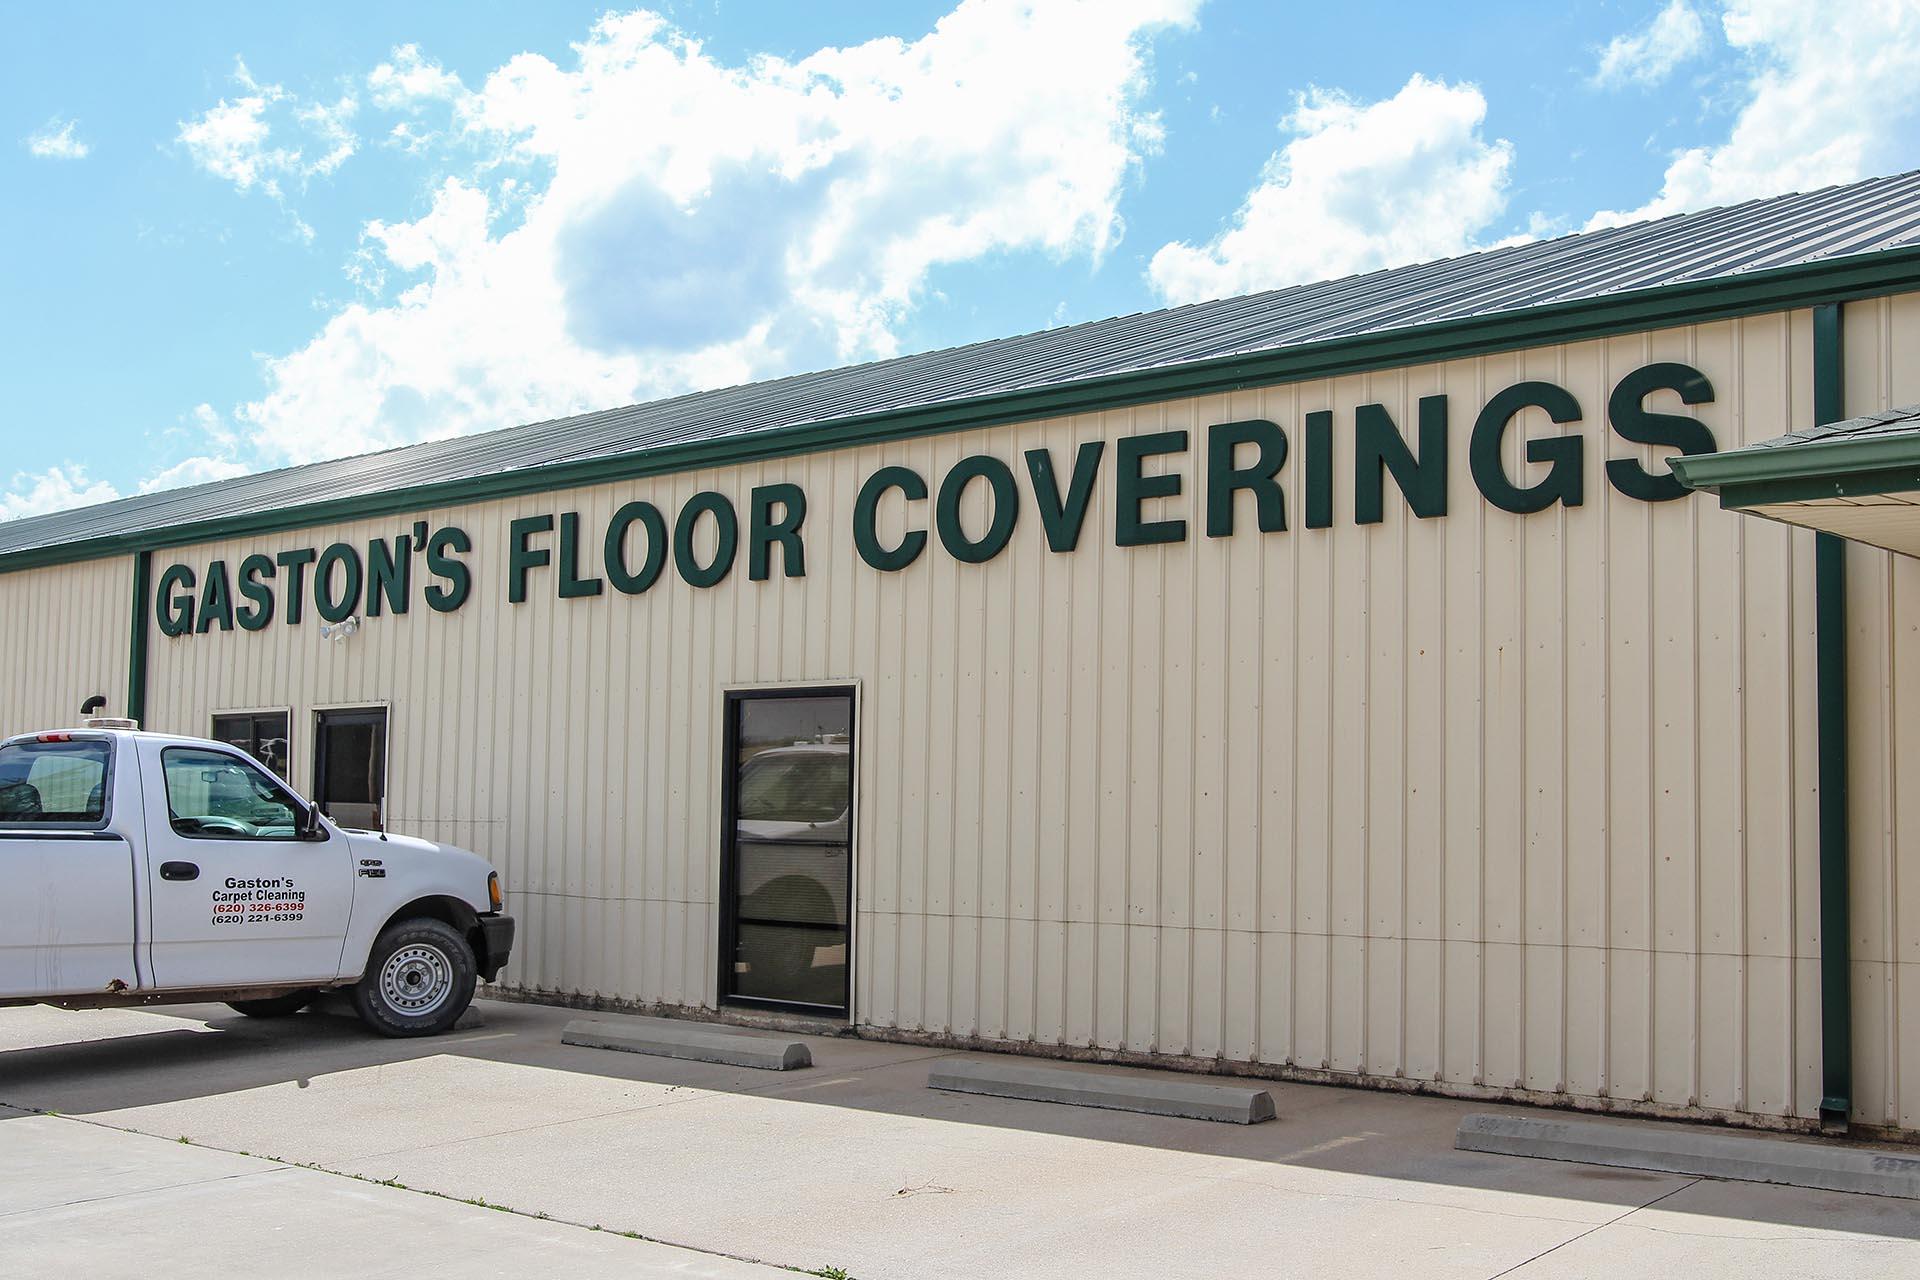 GastonsFloorCovering_Wellington_Outside02_Medium.jpg